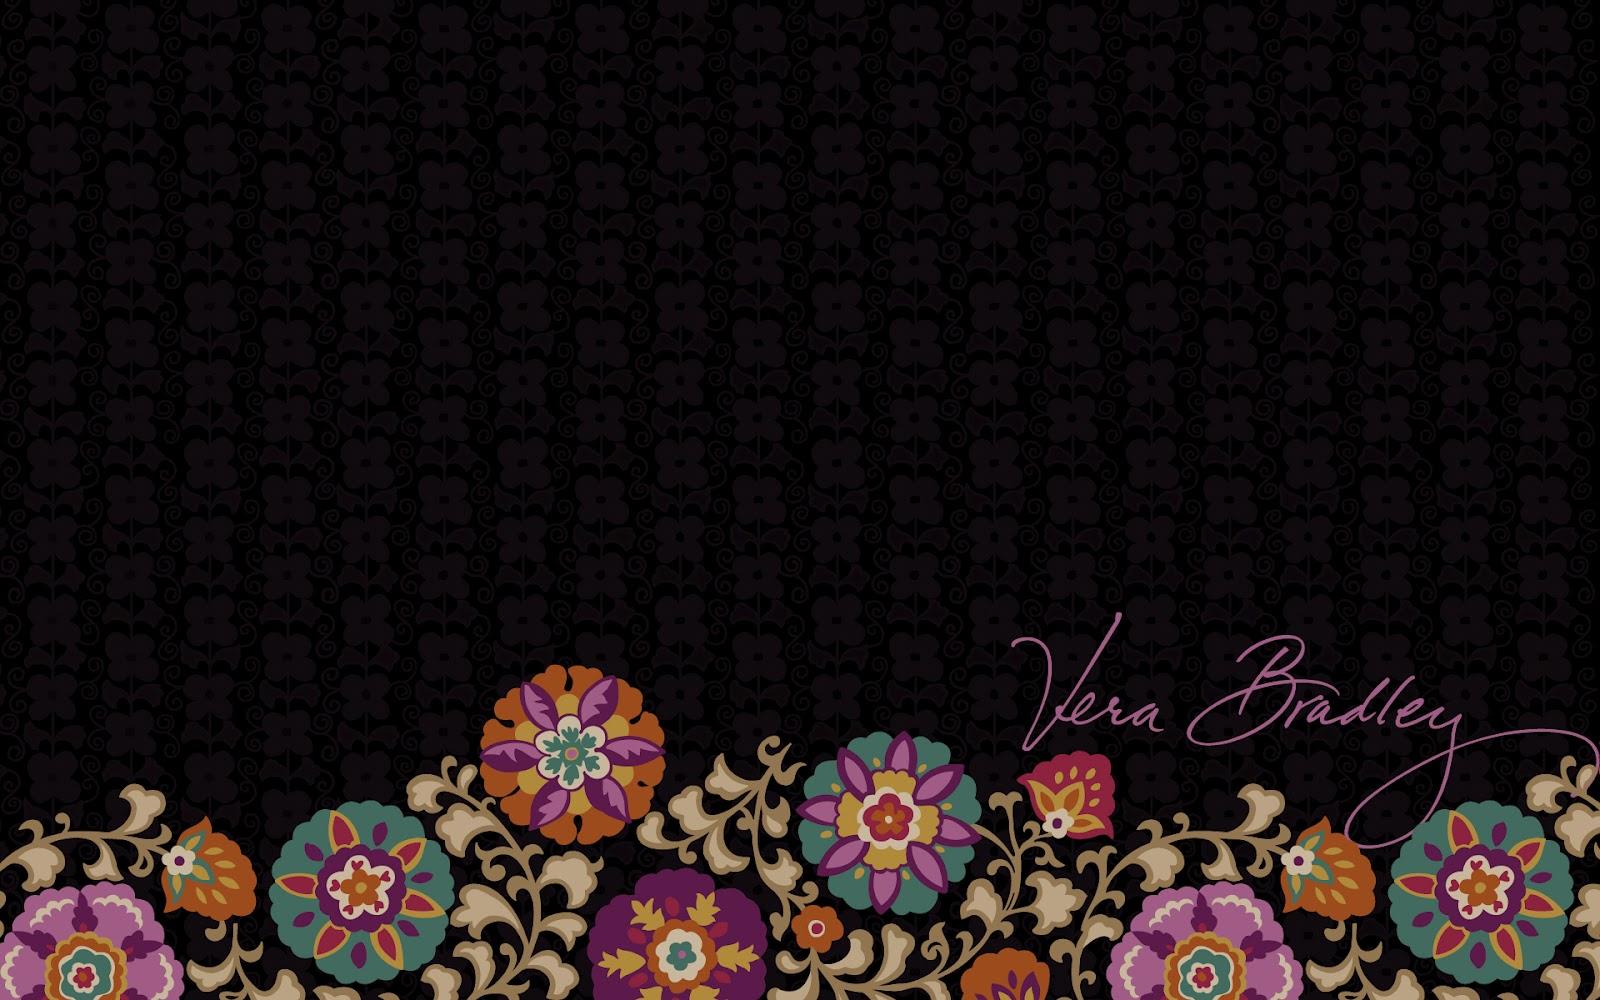 http://4.bp.blogspot.com/-GvsFsMrQ5R0/UEY2MPveJtI/AAAAAAAAN28/-HhXxdGmrZk/s1600/desktop-vb-W11-Suzani-wallpaper.jpg